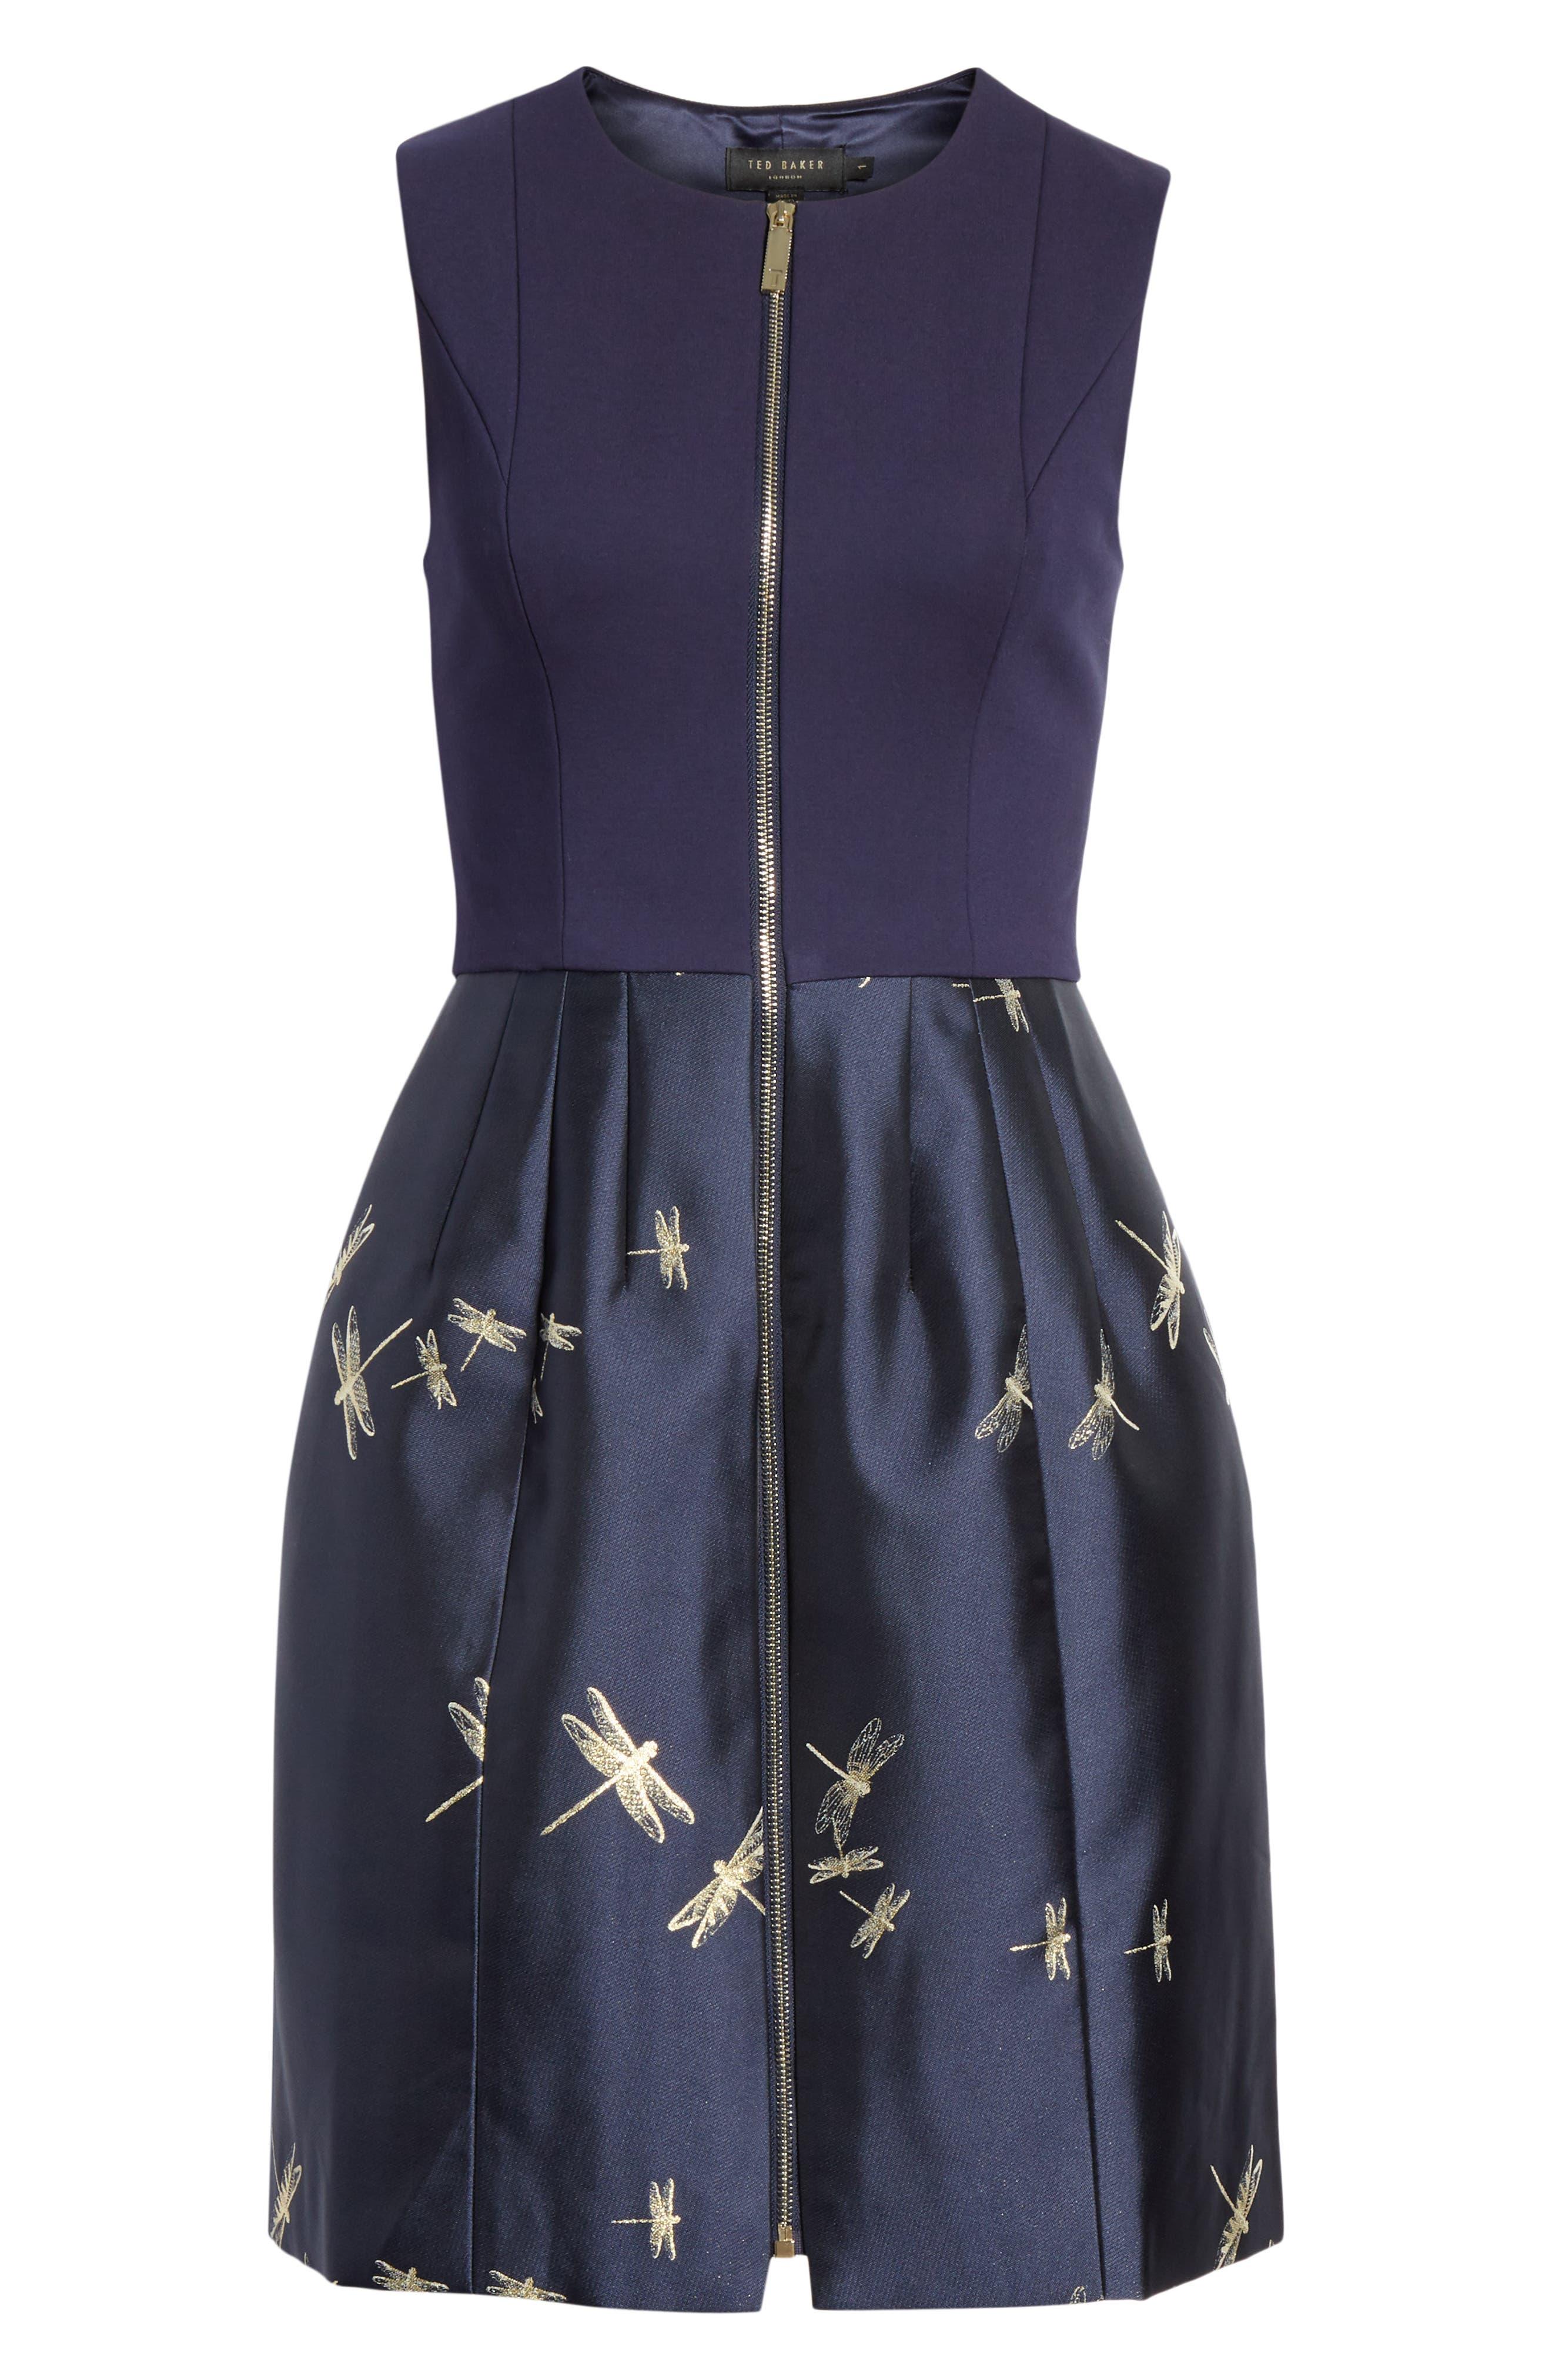 Adellu Fit & Flare Dress,                             Alternate thumbnail 8, color,                             NAVY